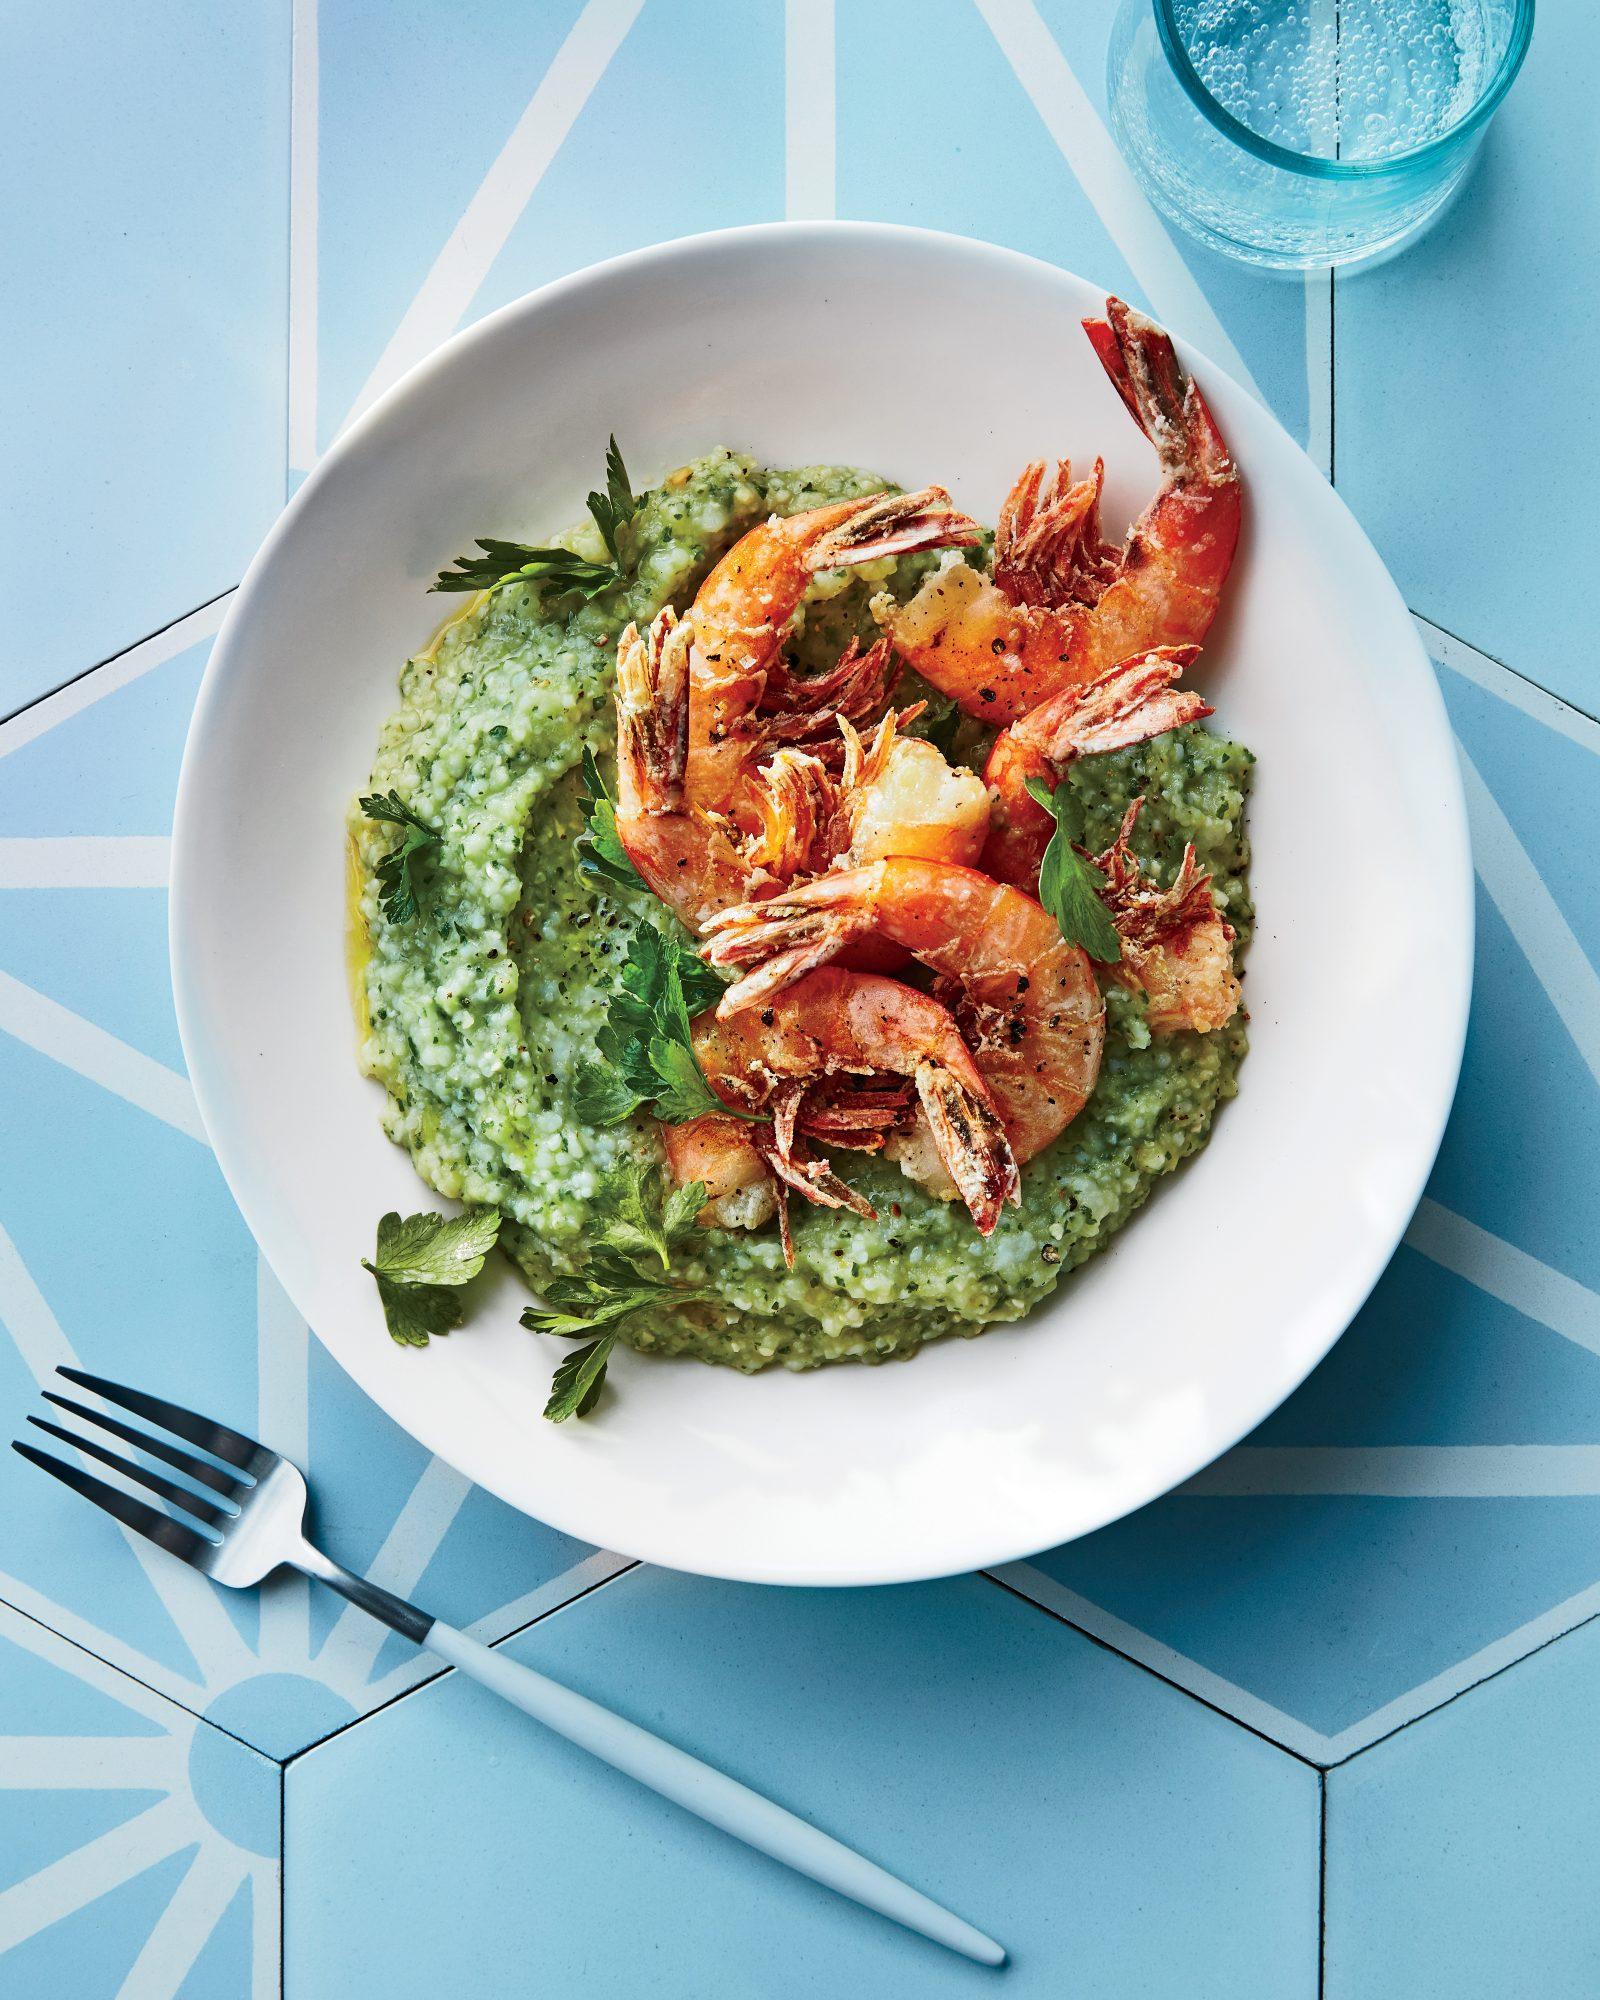 Crispy Salt-and-Pepper Shrimp over Green Grits